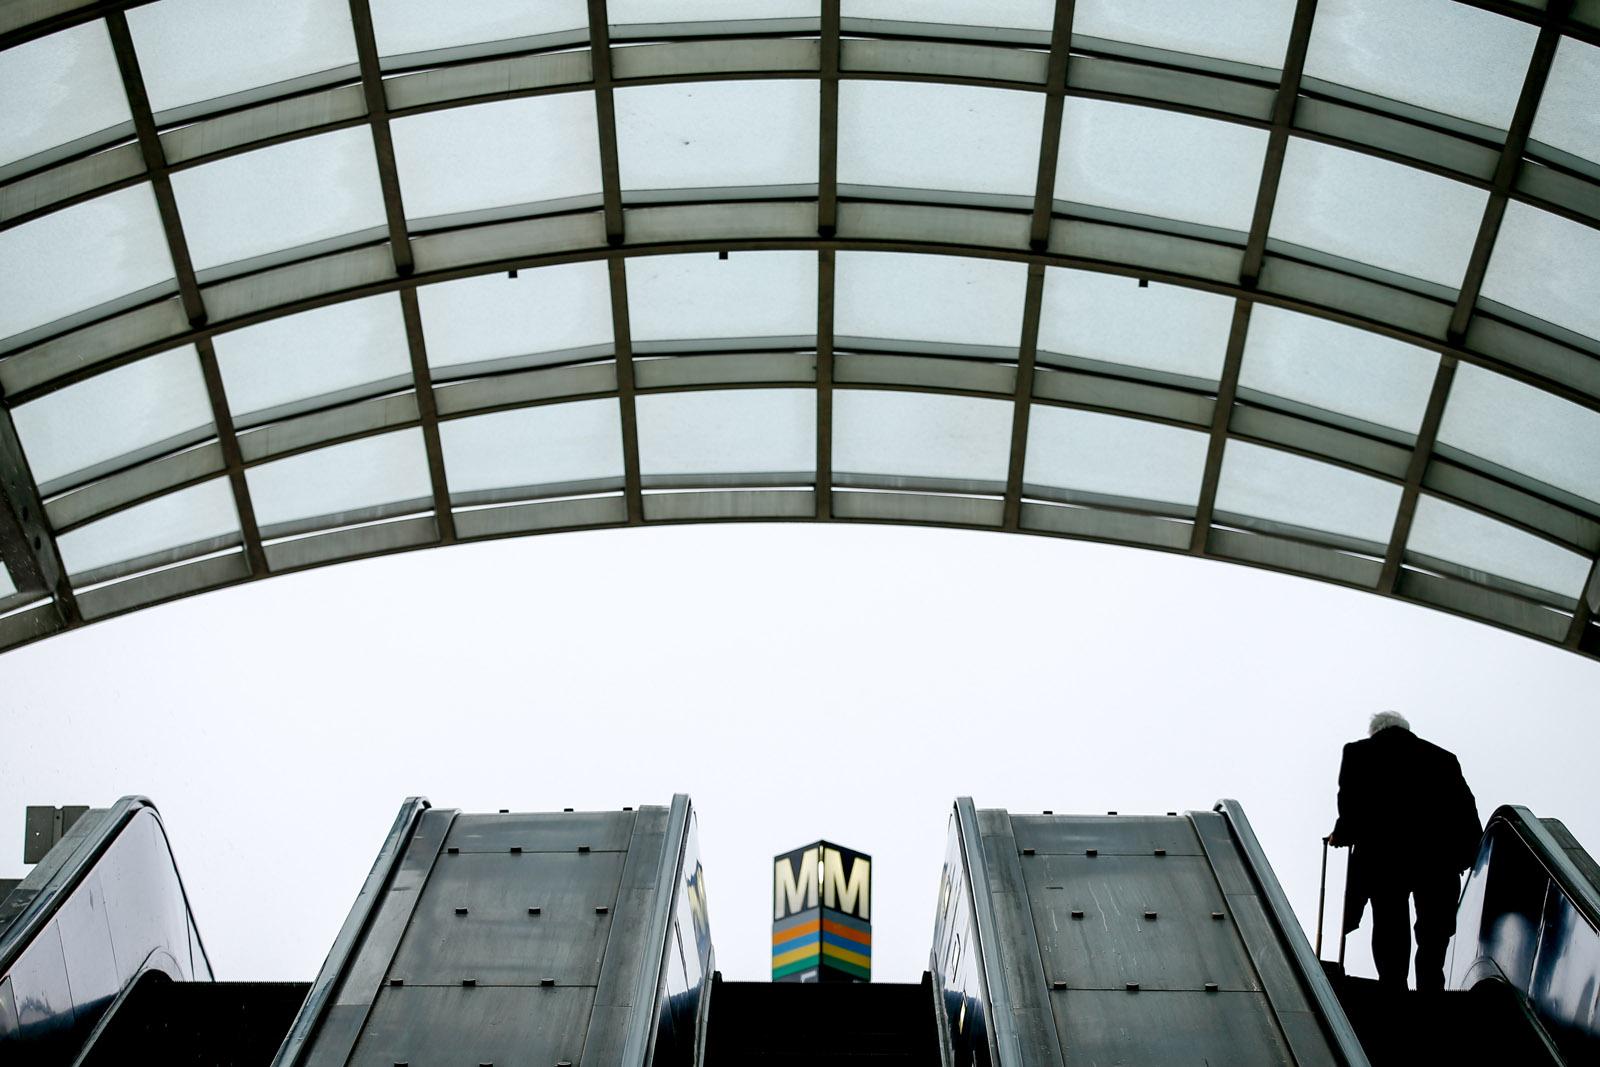 Metro bridge, tunnel repairs will force extended shutdown of Yellow line